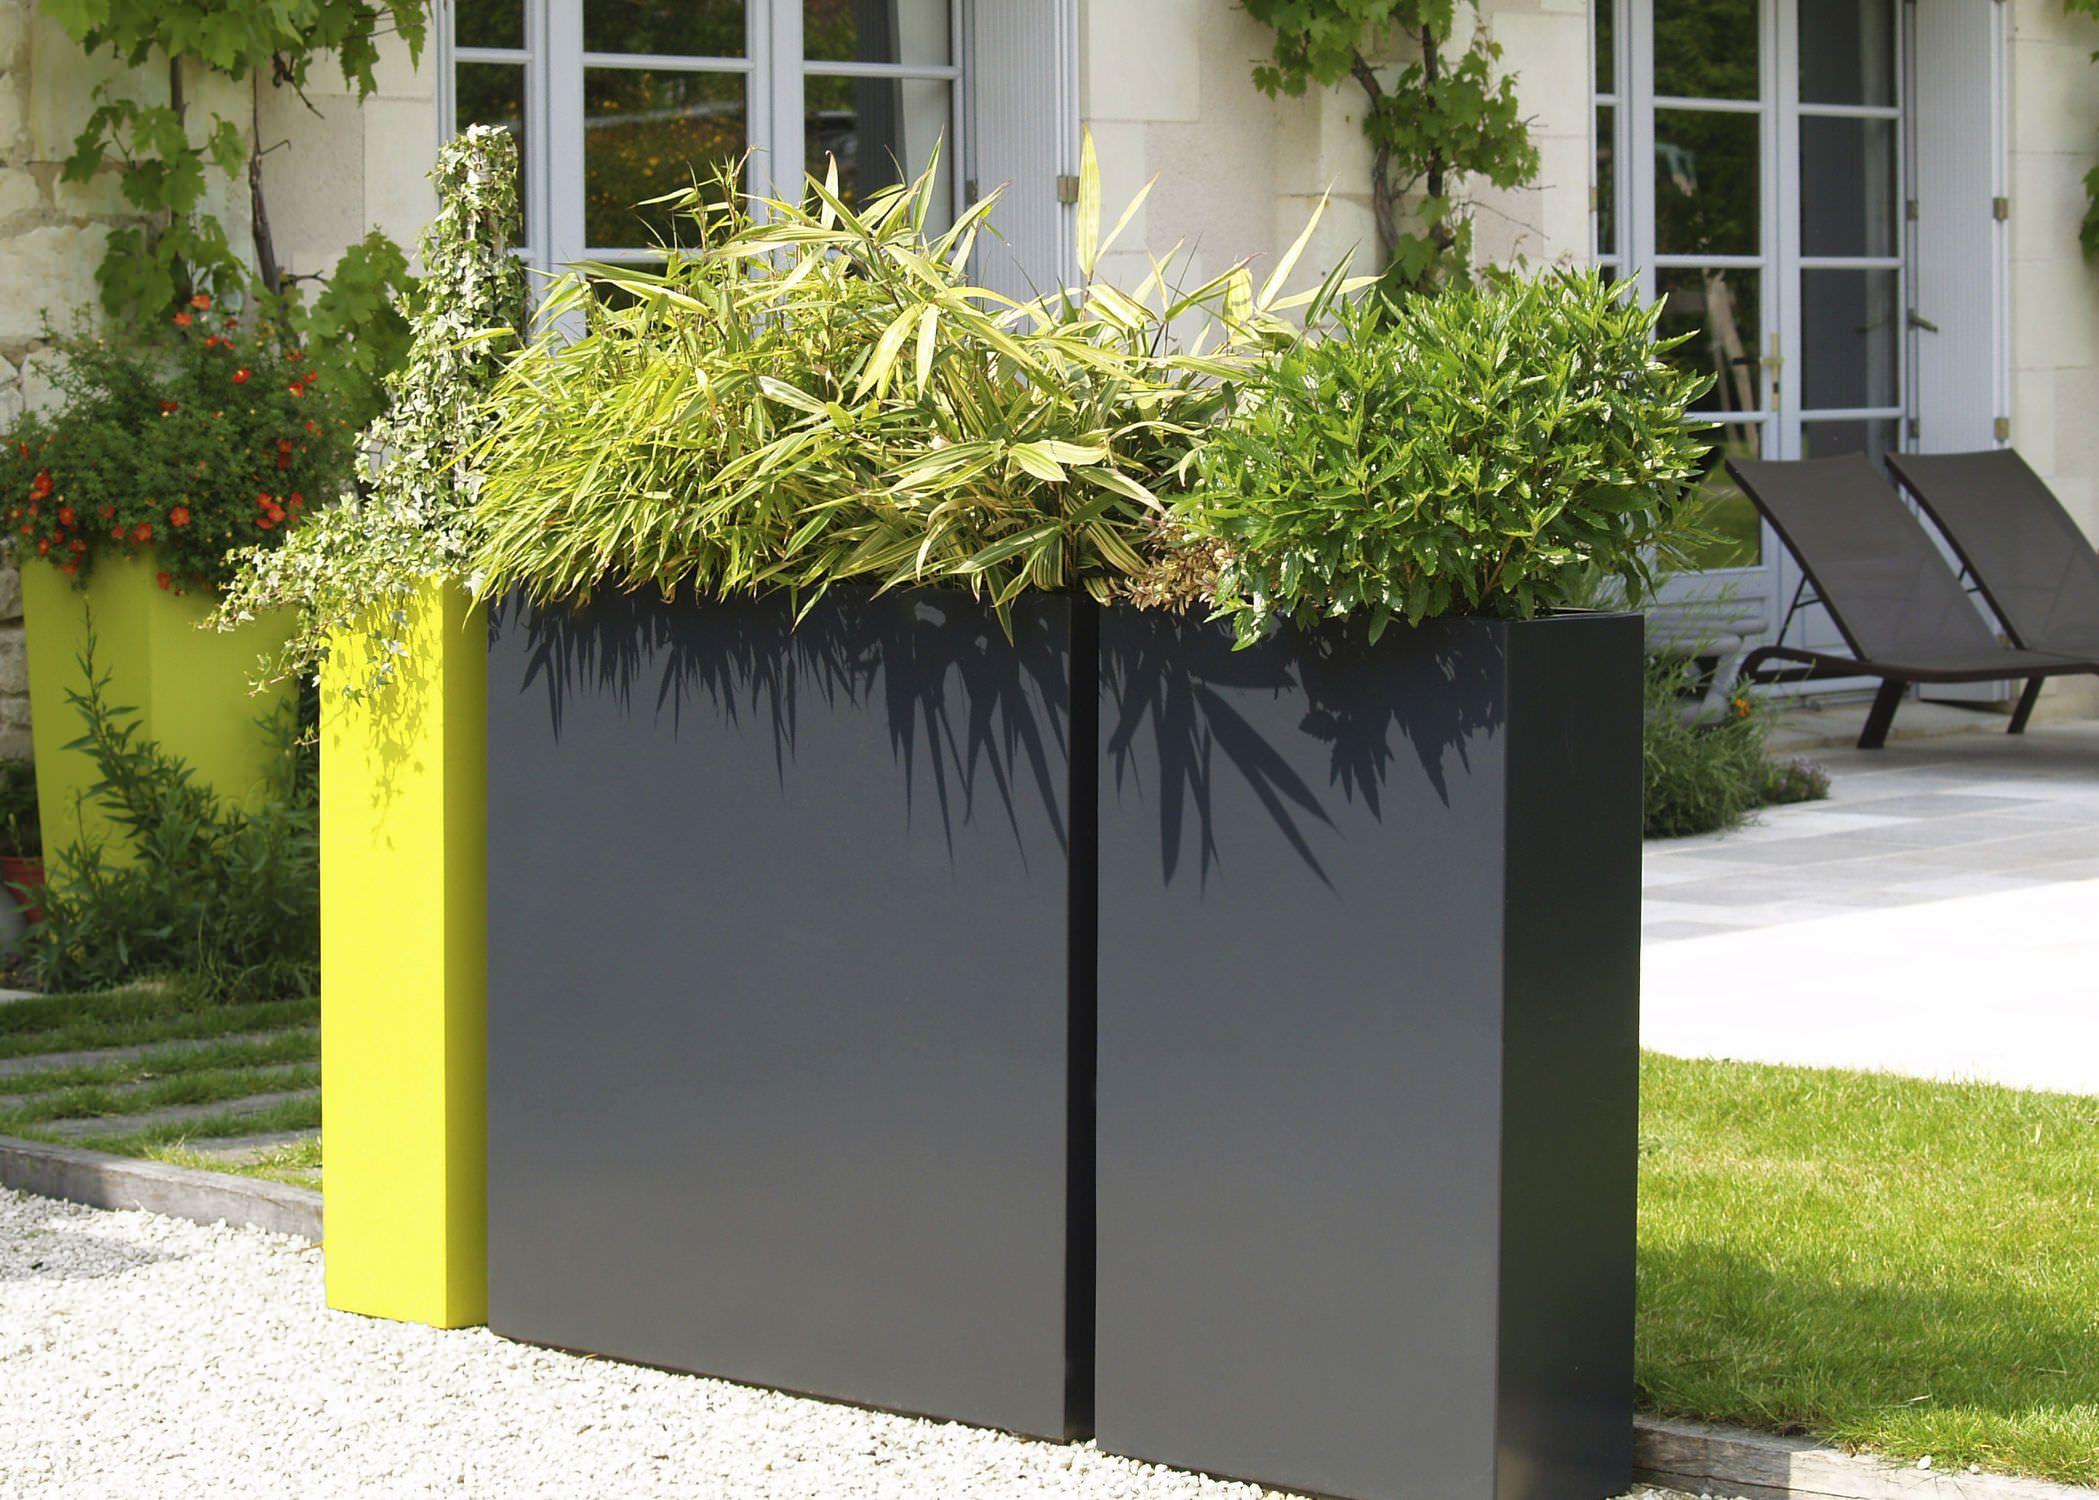 commercial w planter fiberglass studio rectangular tall rectangle grade liner tal planters with teak